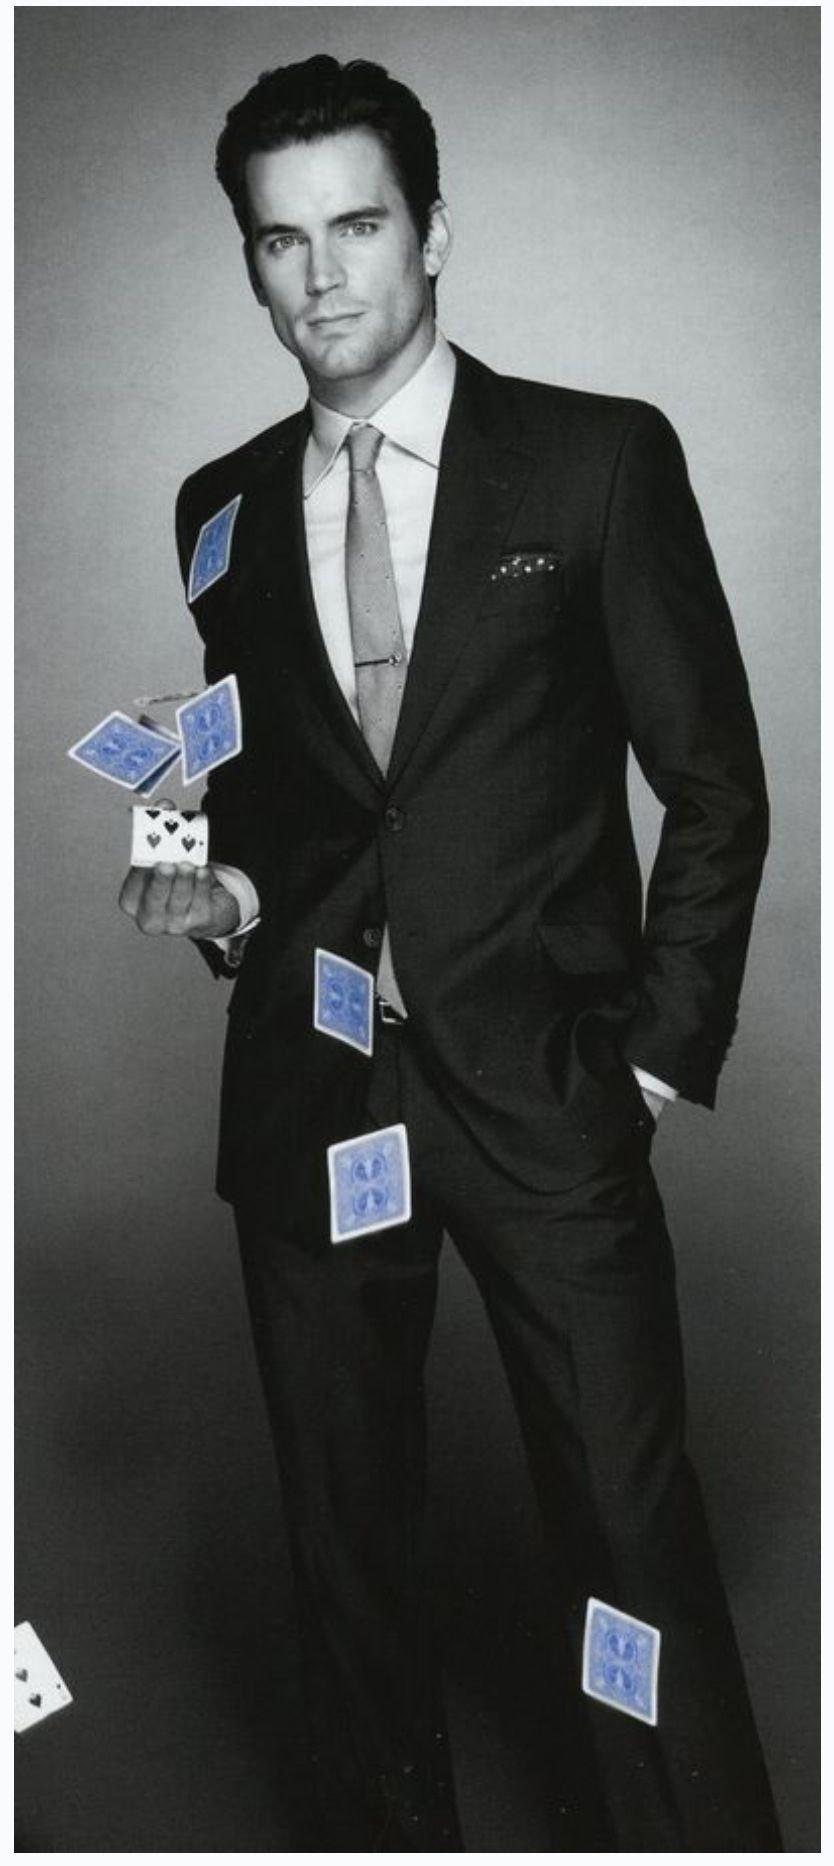 10 Lovely Senior Project Ideas For Guys classy senior picture ideas for guys suit and tie senior pictures 2020